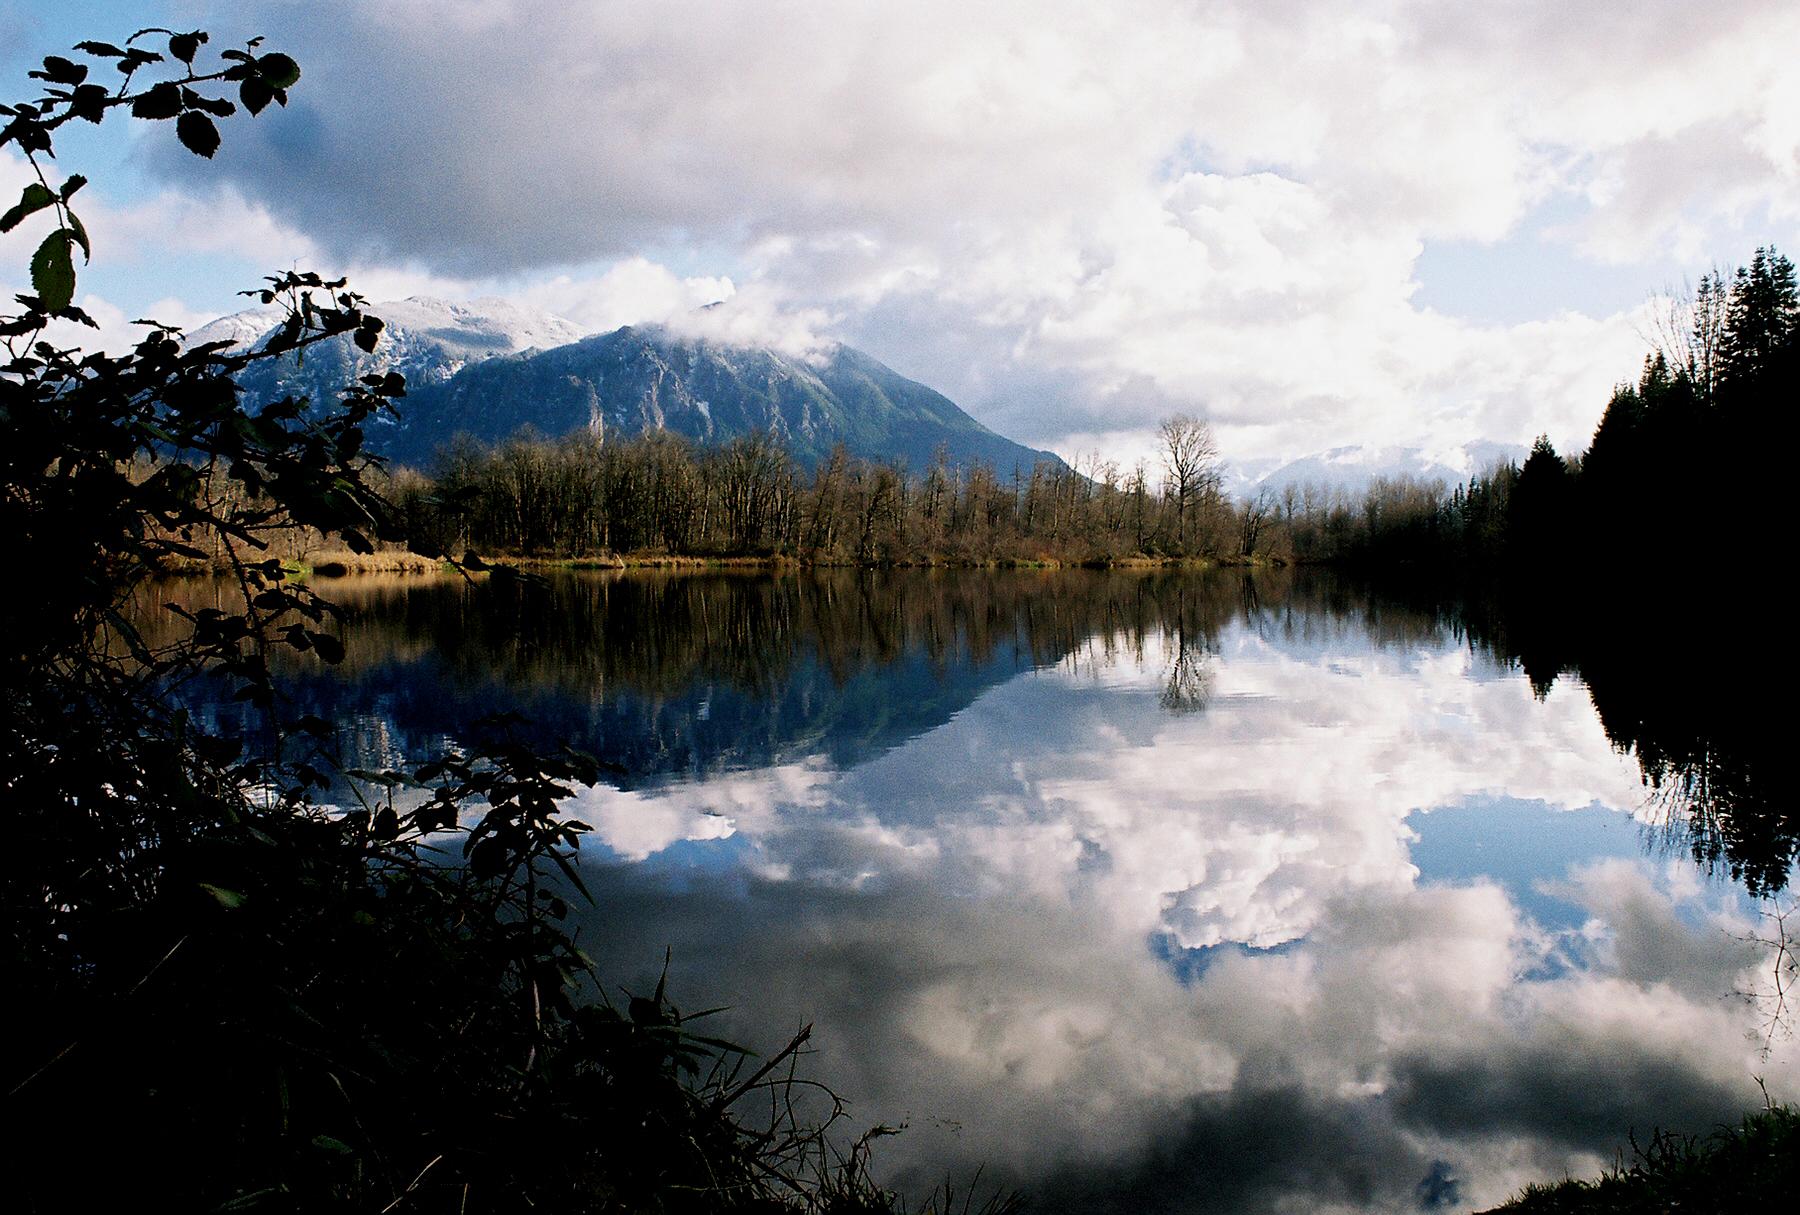 Mt Si, Snoqualmie, WA